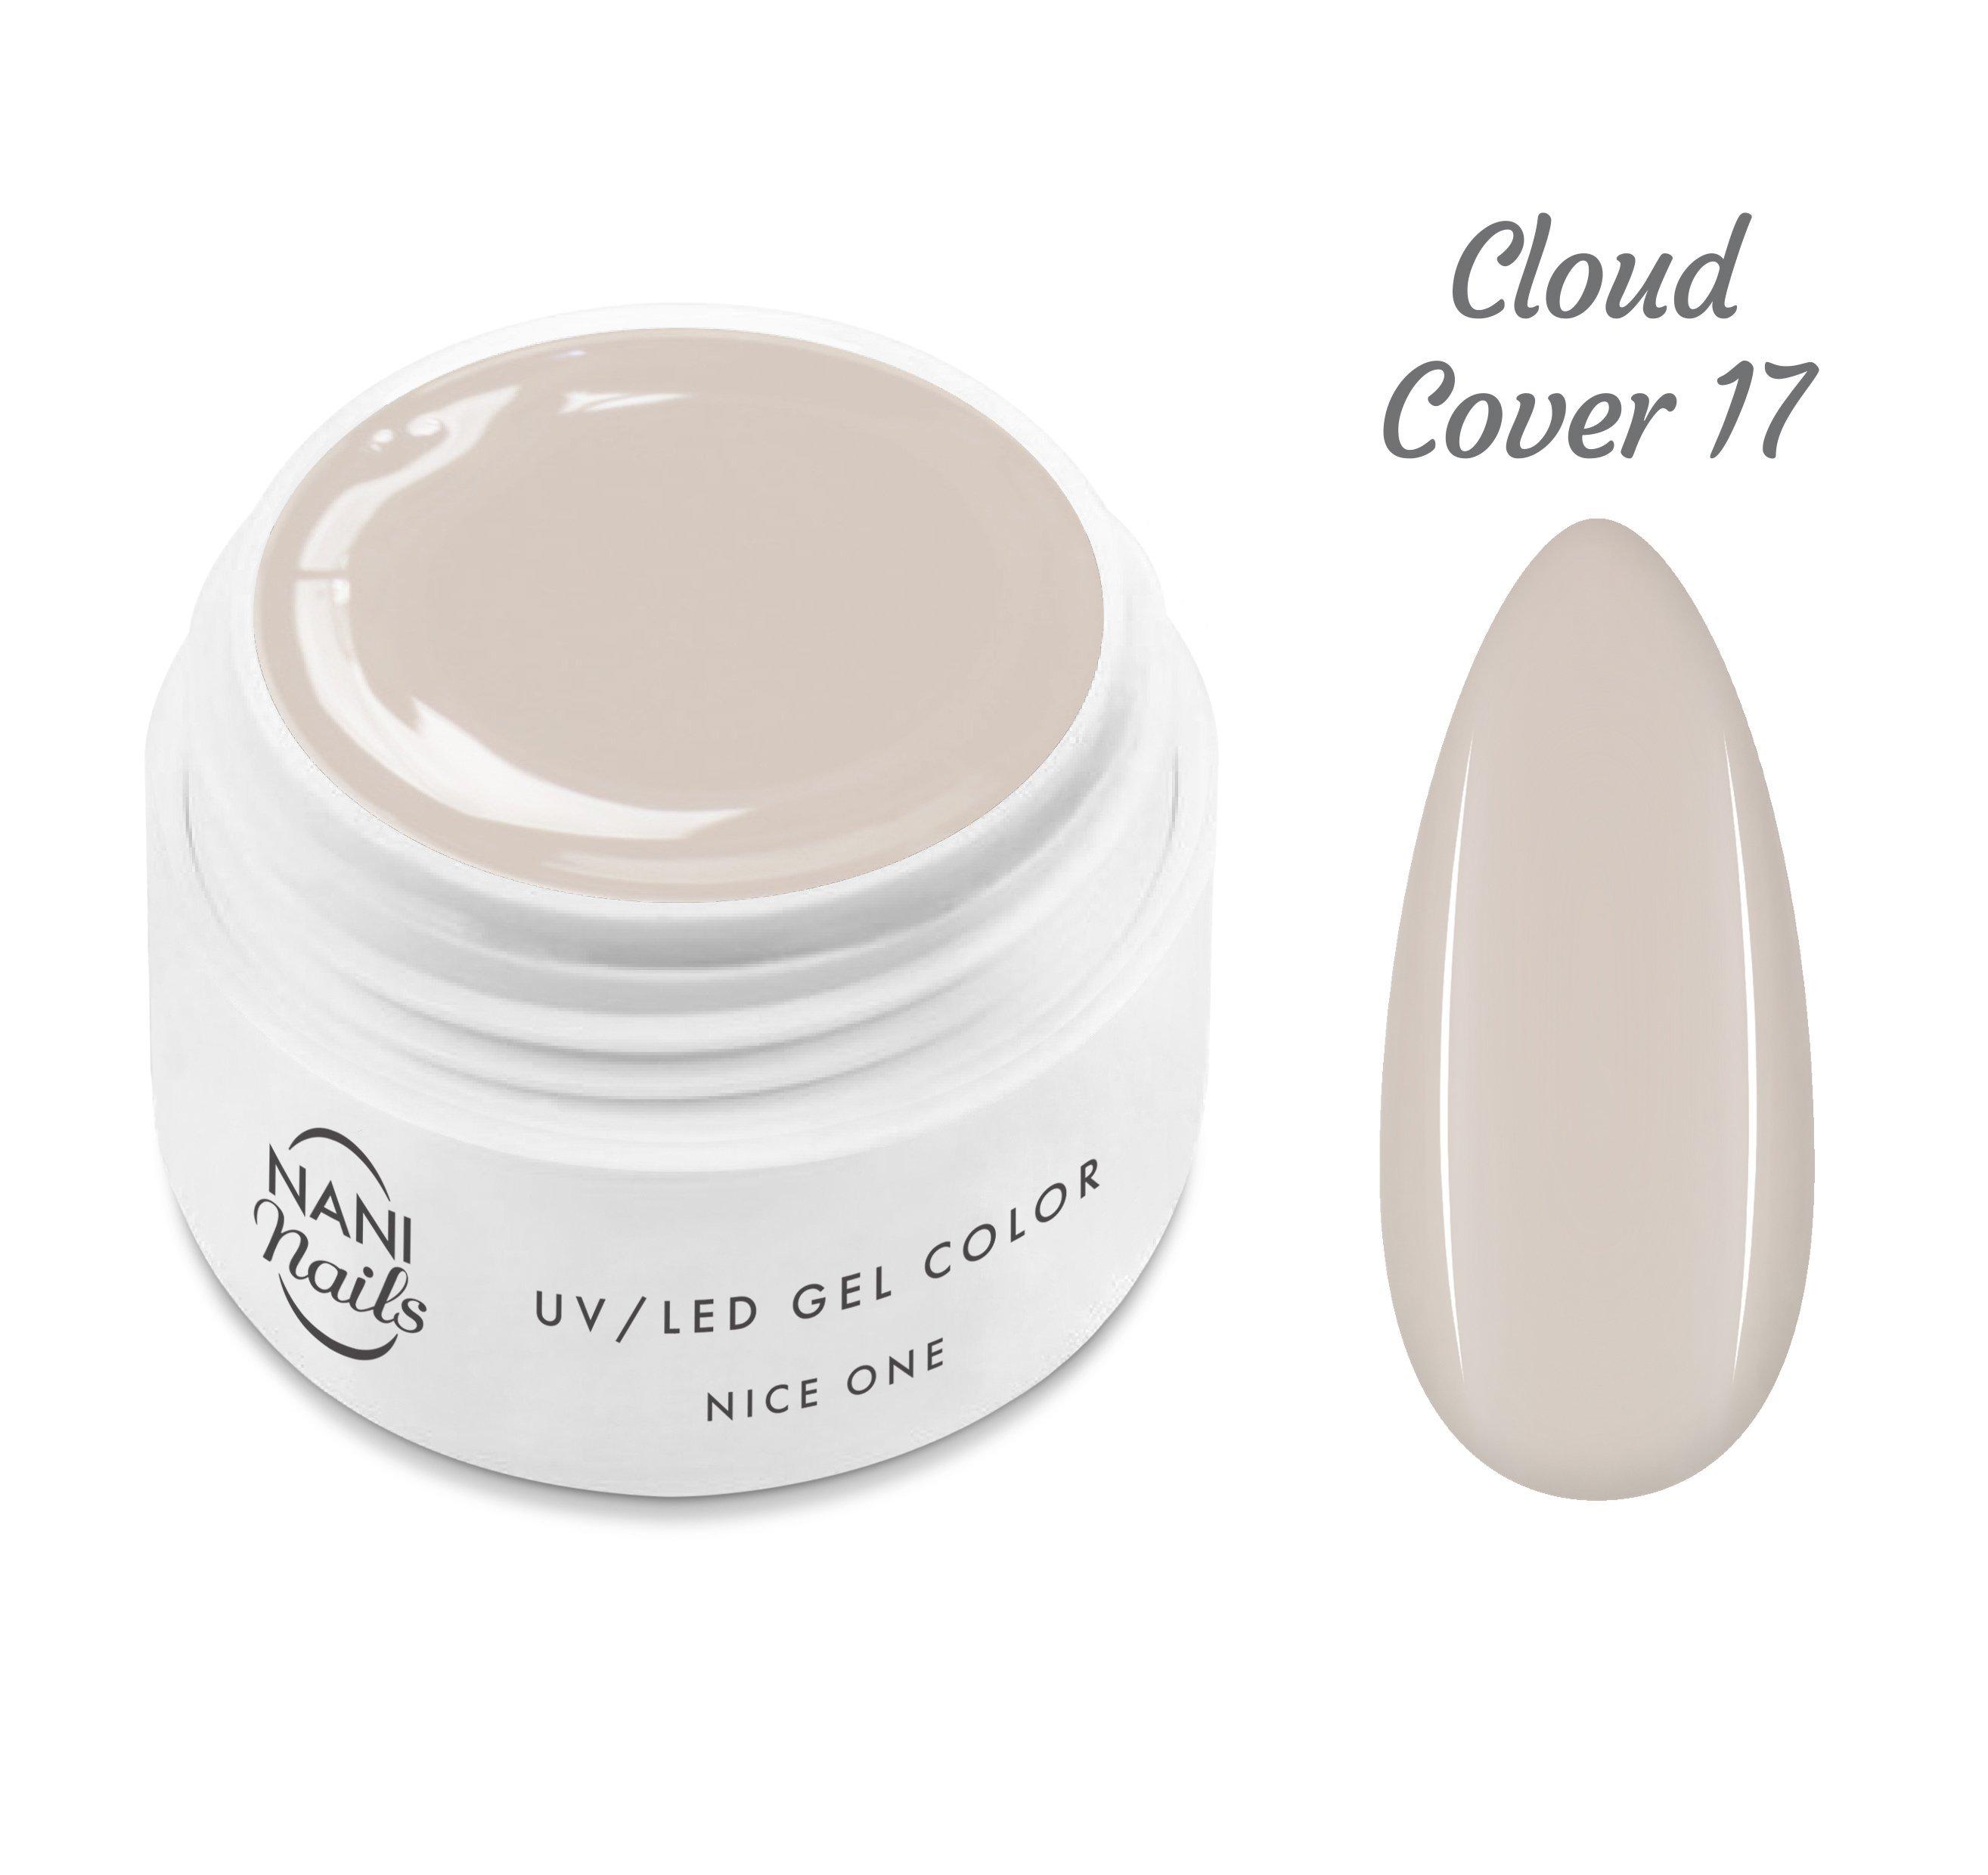 NANI UV gél Nice One Color 5 ml - Cloud Cover